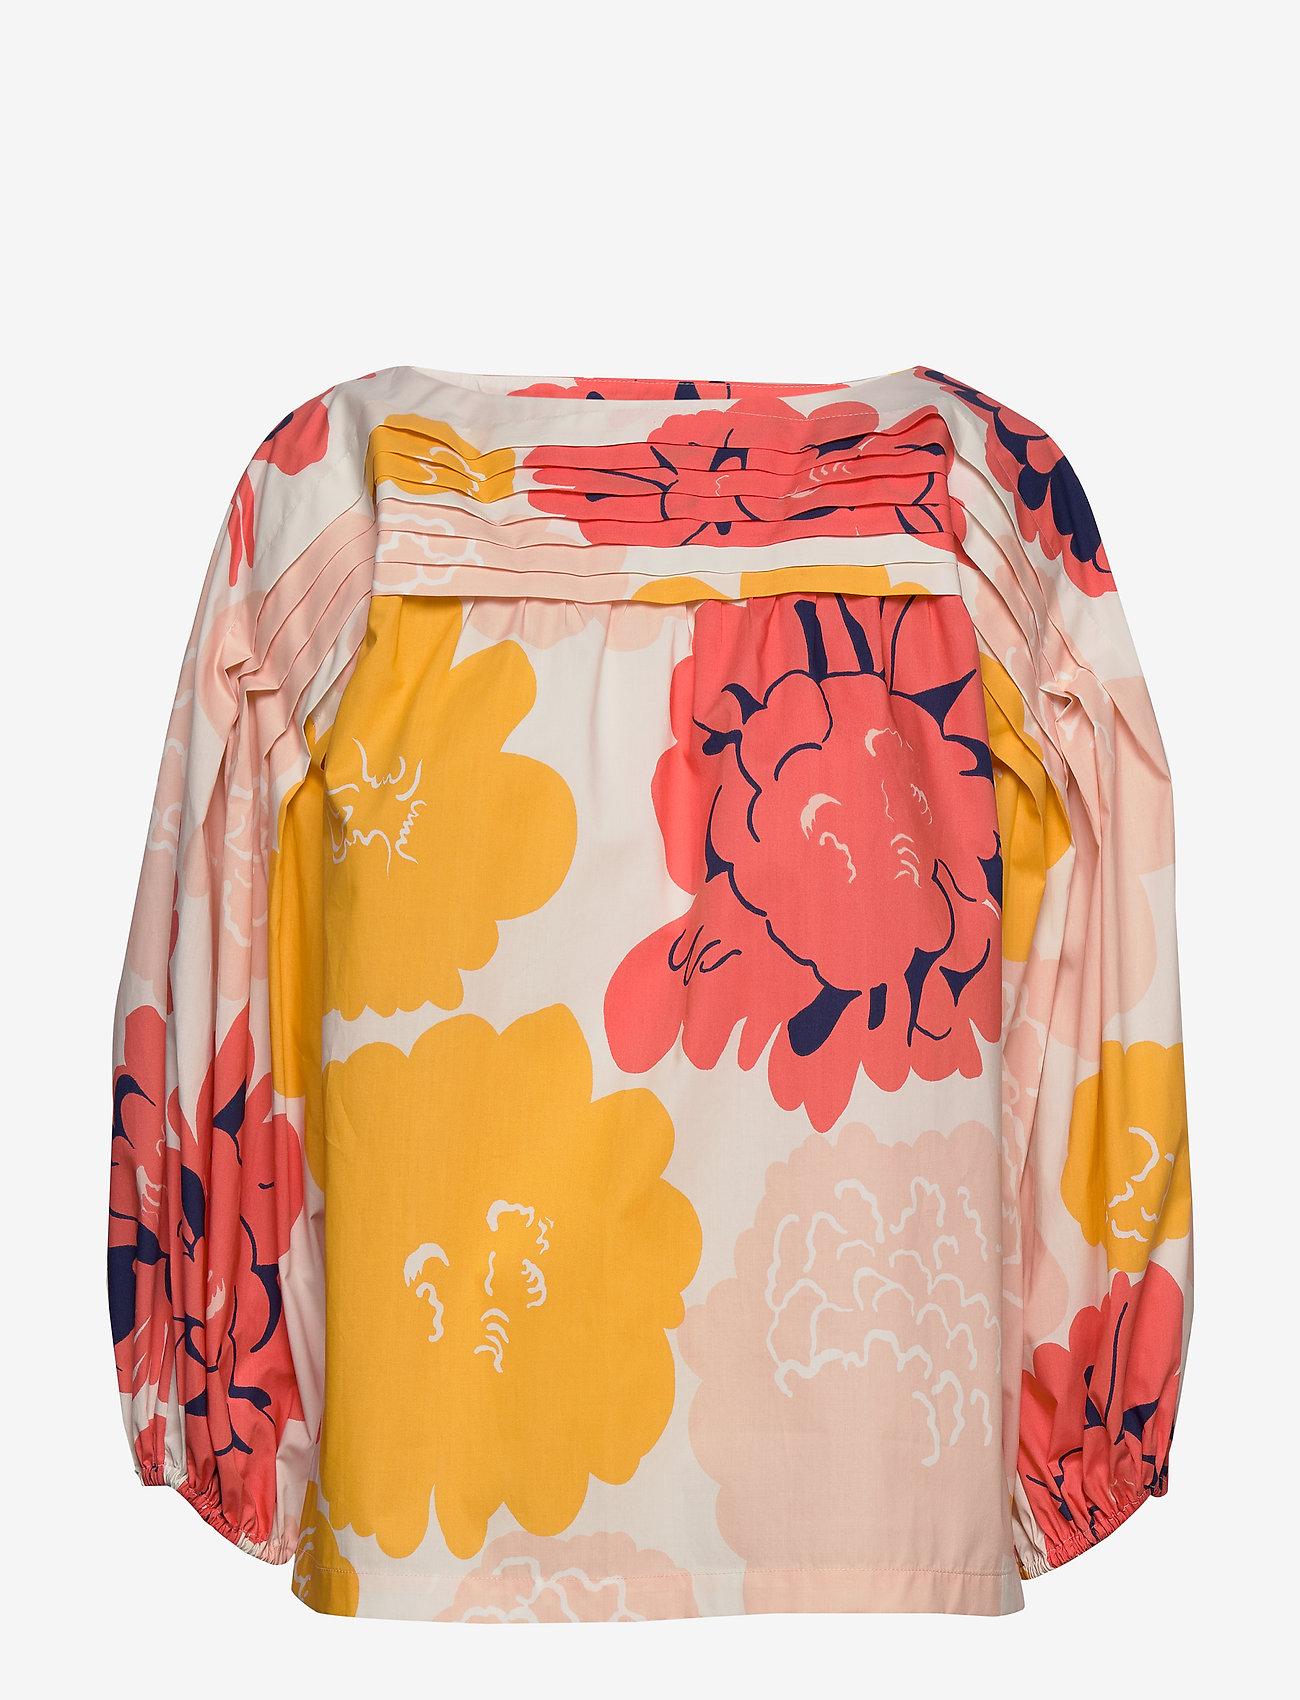 Mukura Pioni Shirt (Peach, Yellow, Coral) - Marimekko lvNLP8